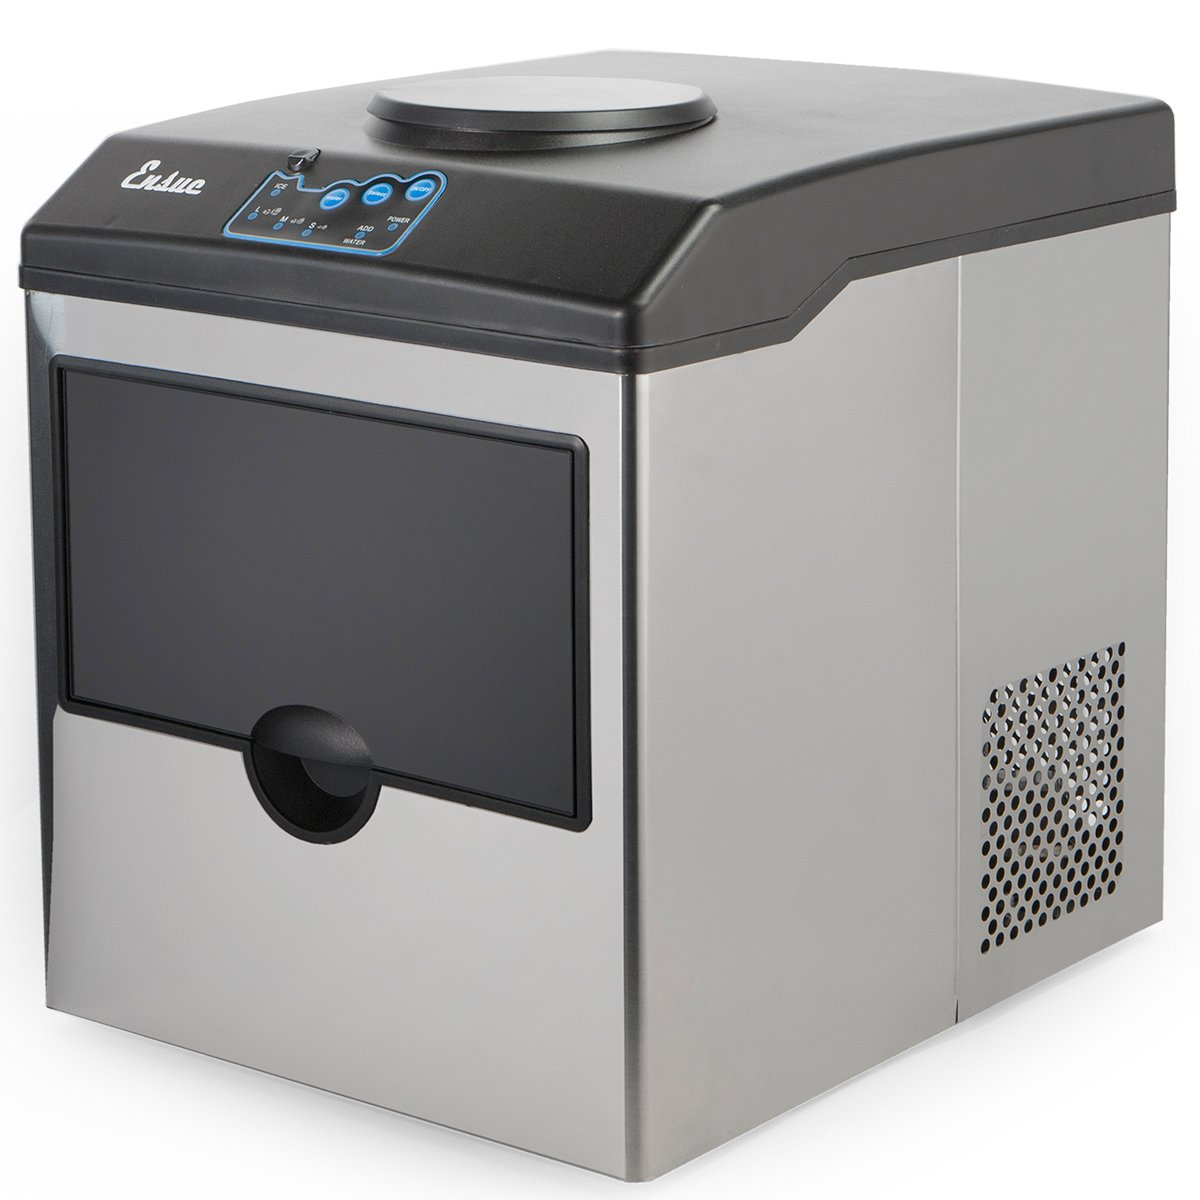 Amazon.com: Ice Makers: Appliances